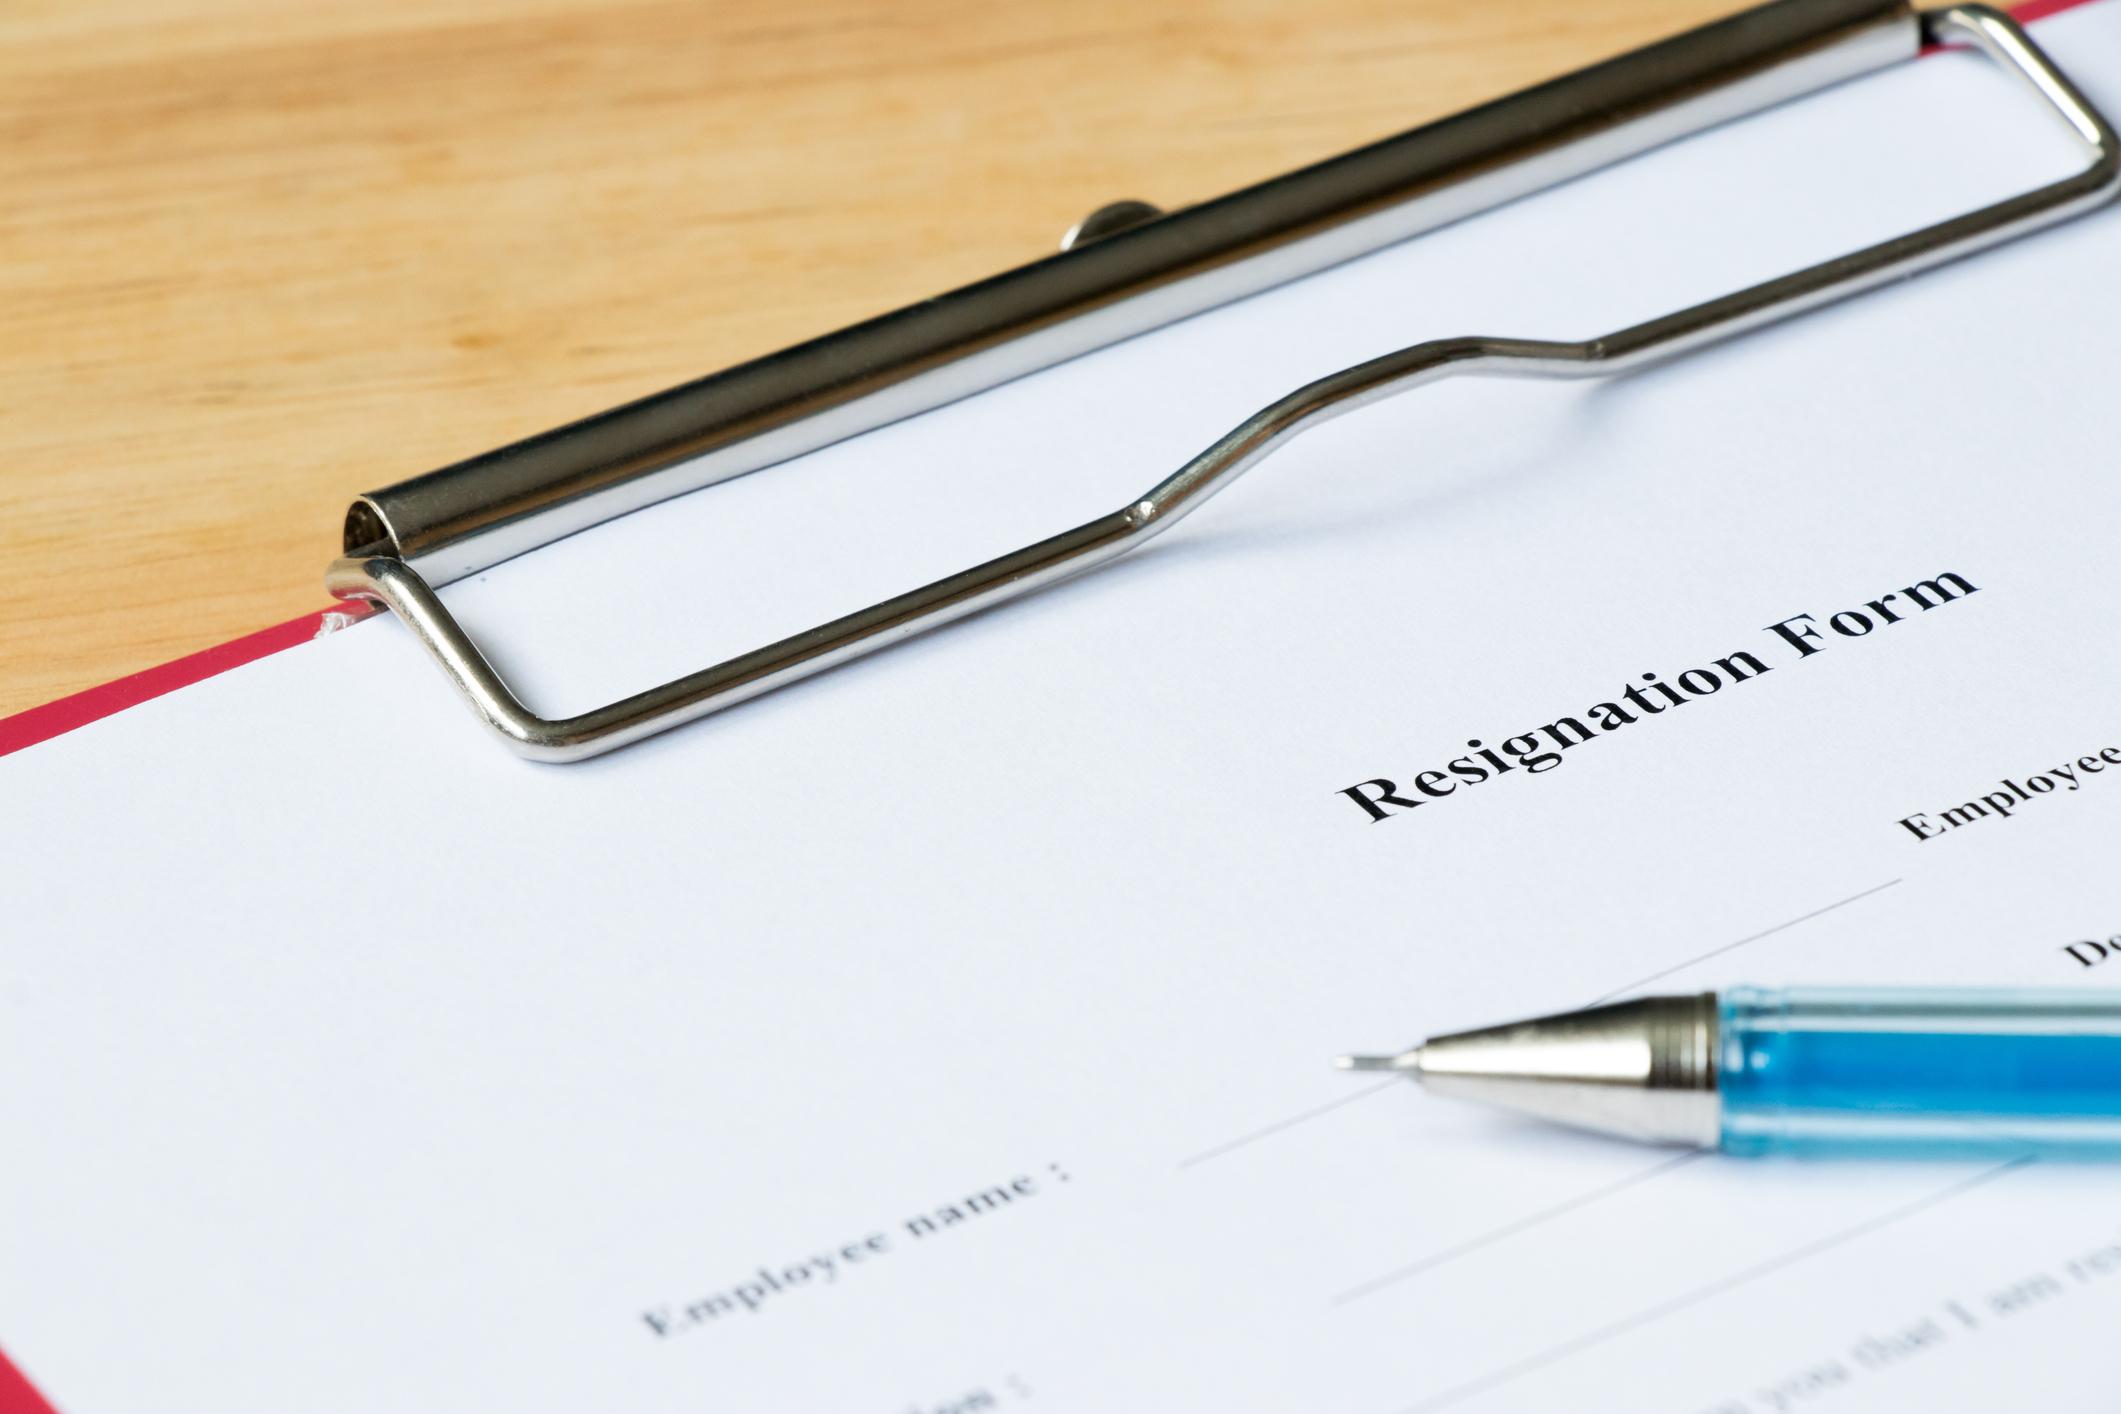 Resignation form on a clipboard